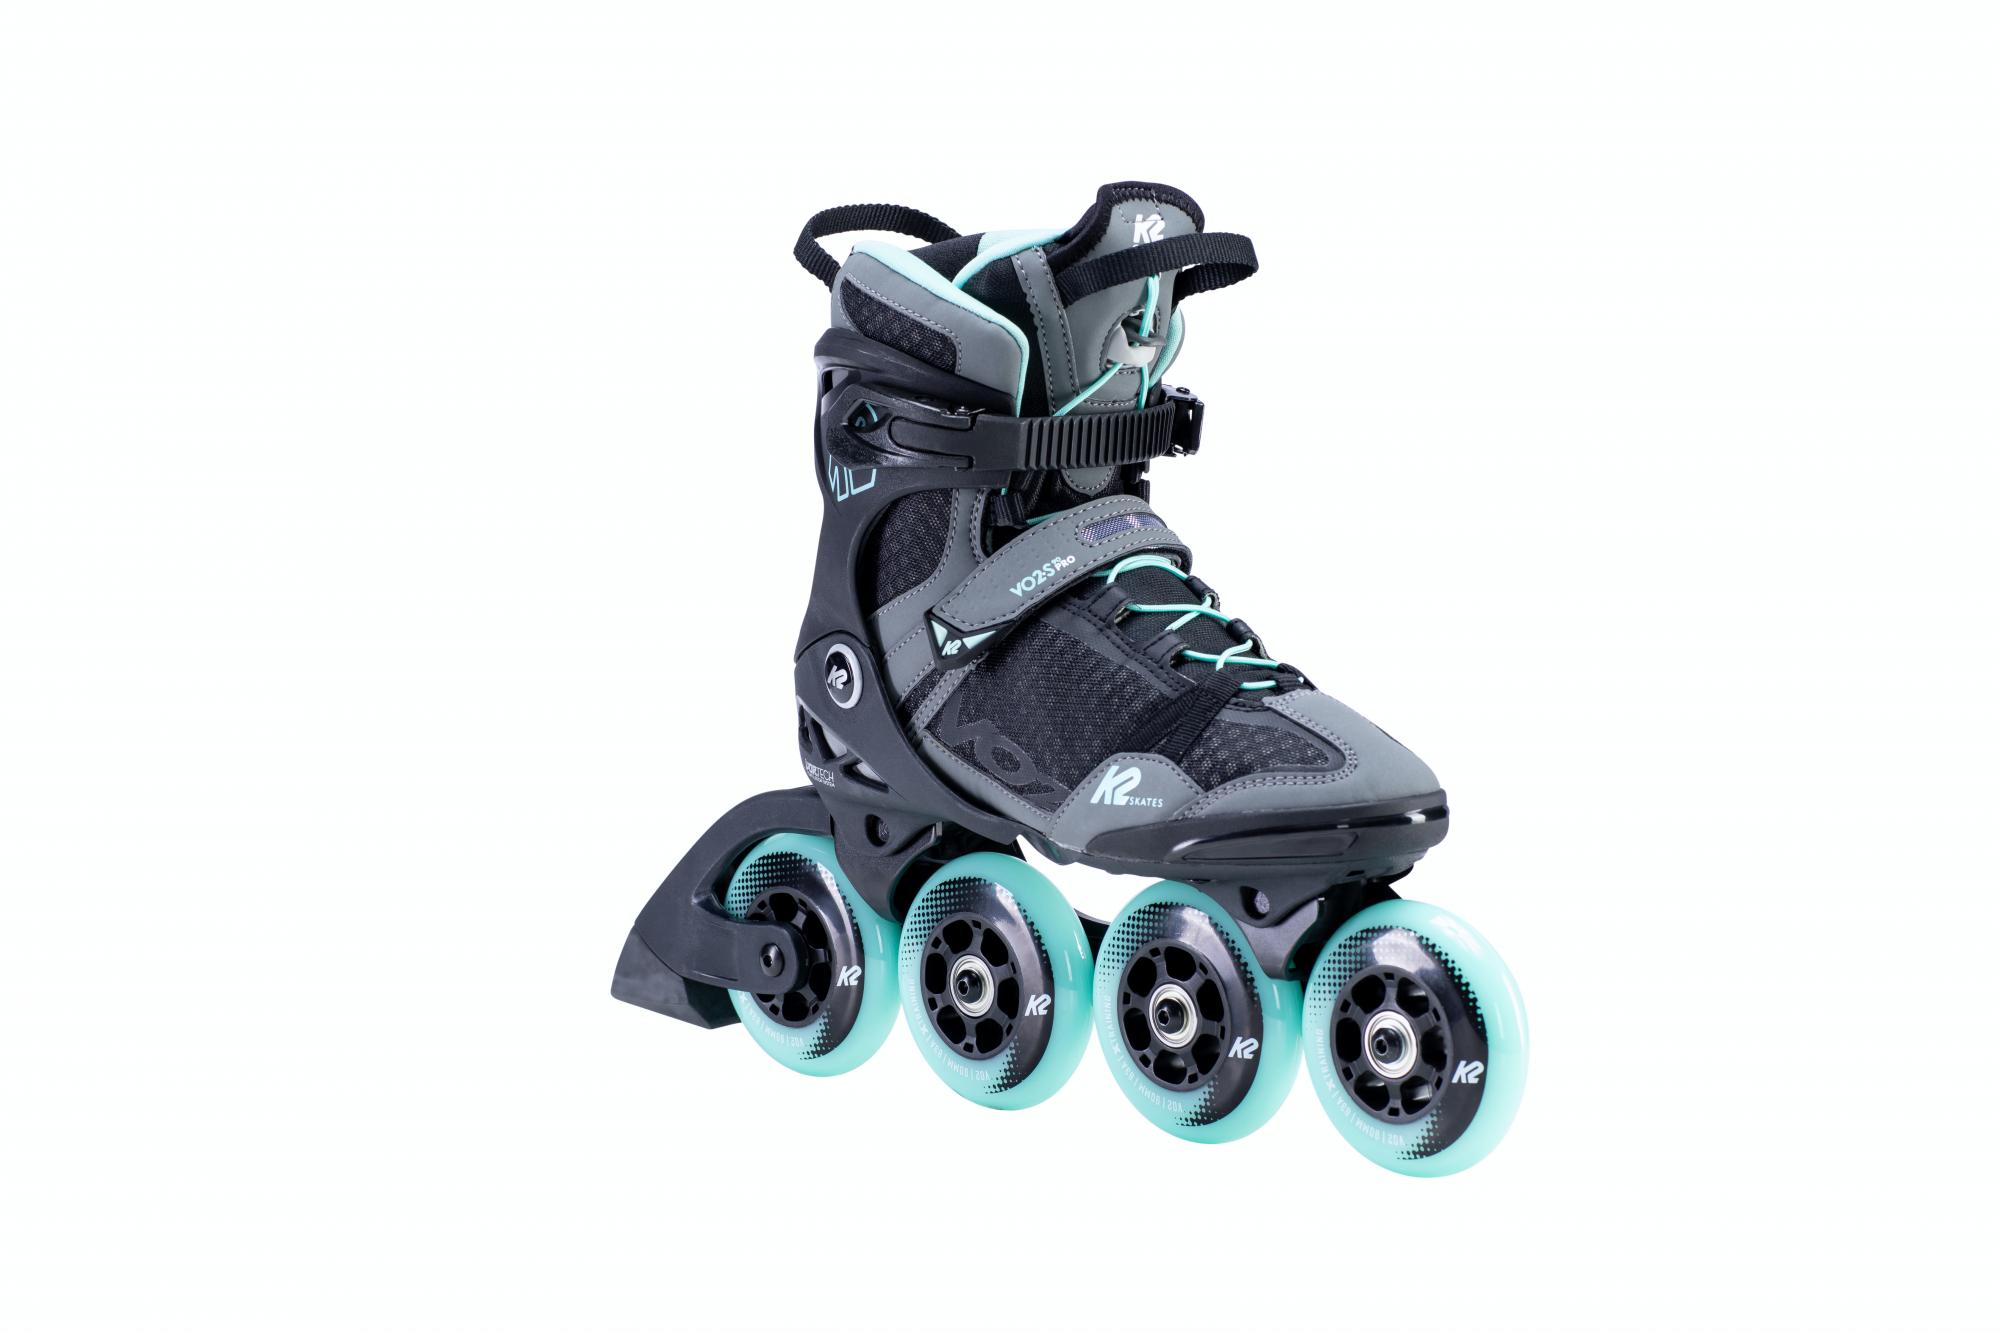 2021 K2 VO2 S 90 Pro Women's Inline Skates